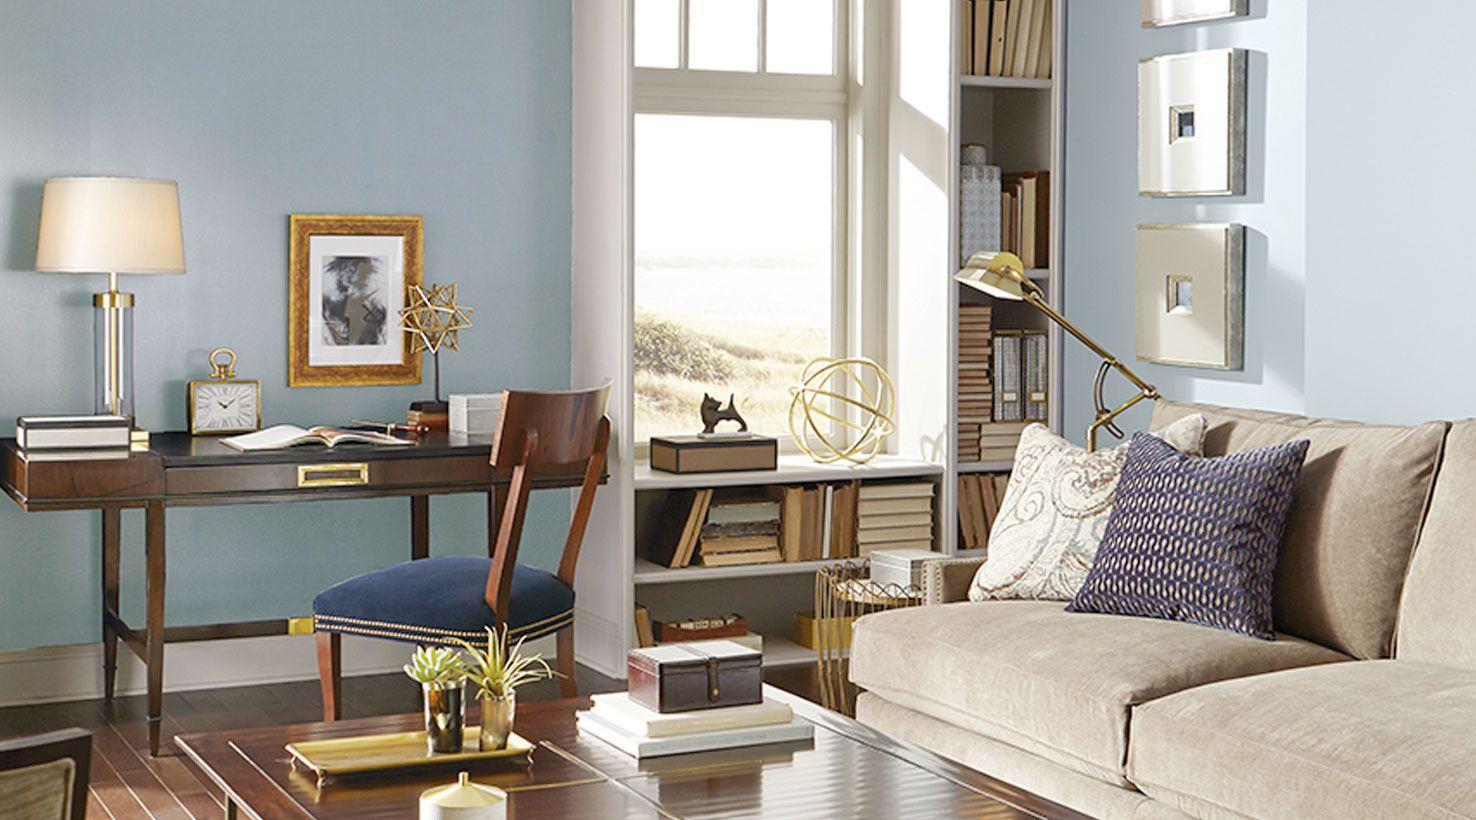 living room paint color ideas inspiration gallery on living room color inspiration id=64666